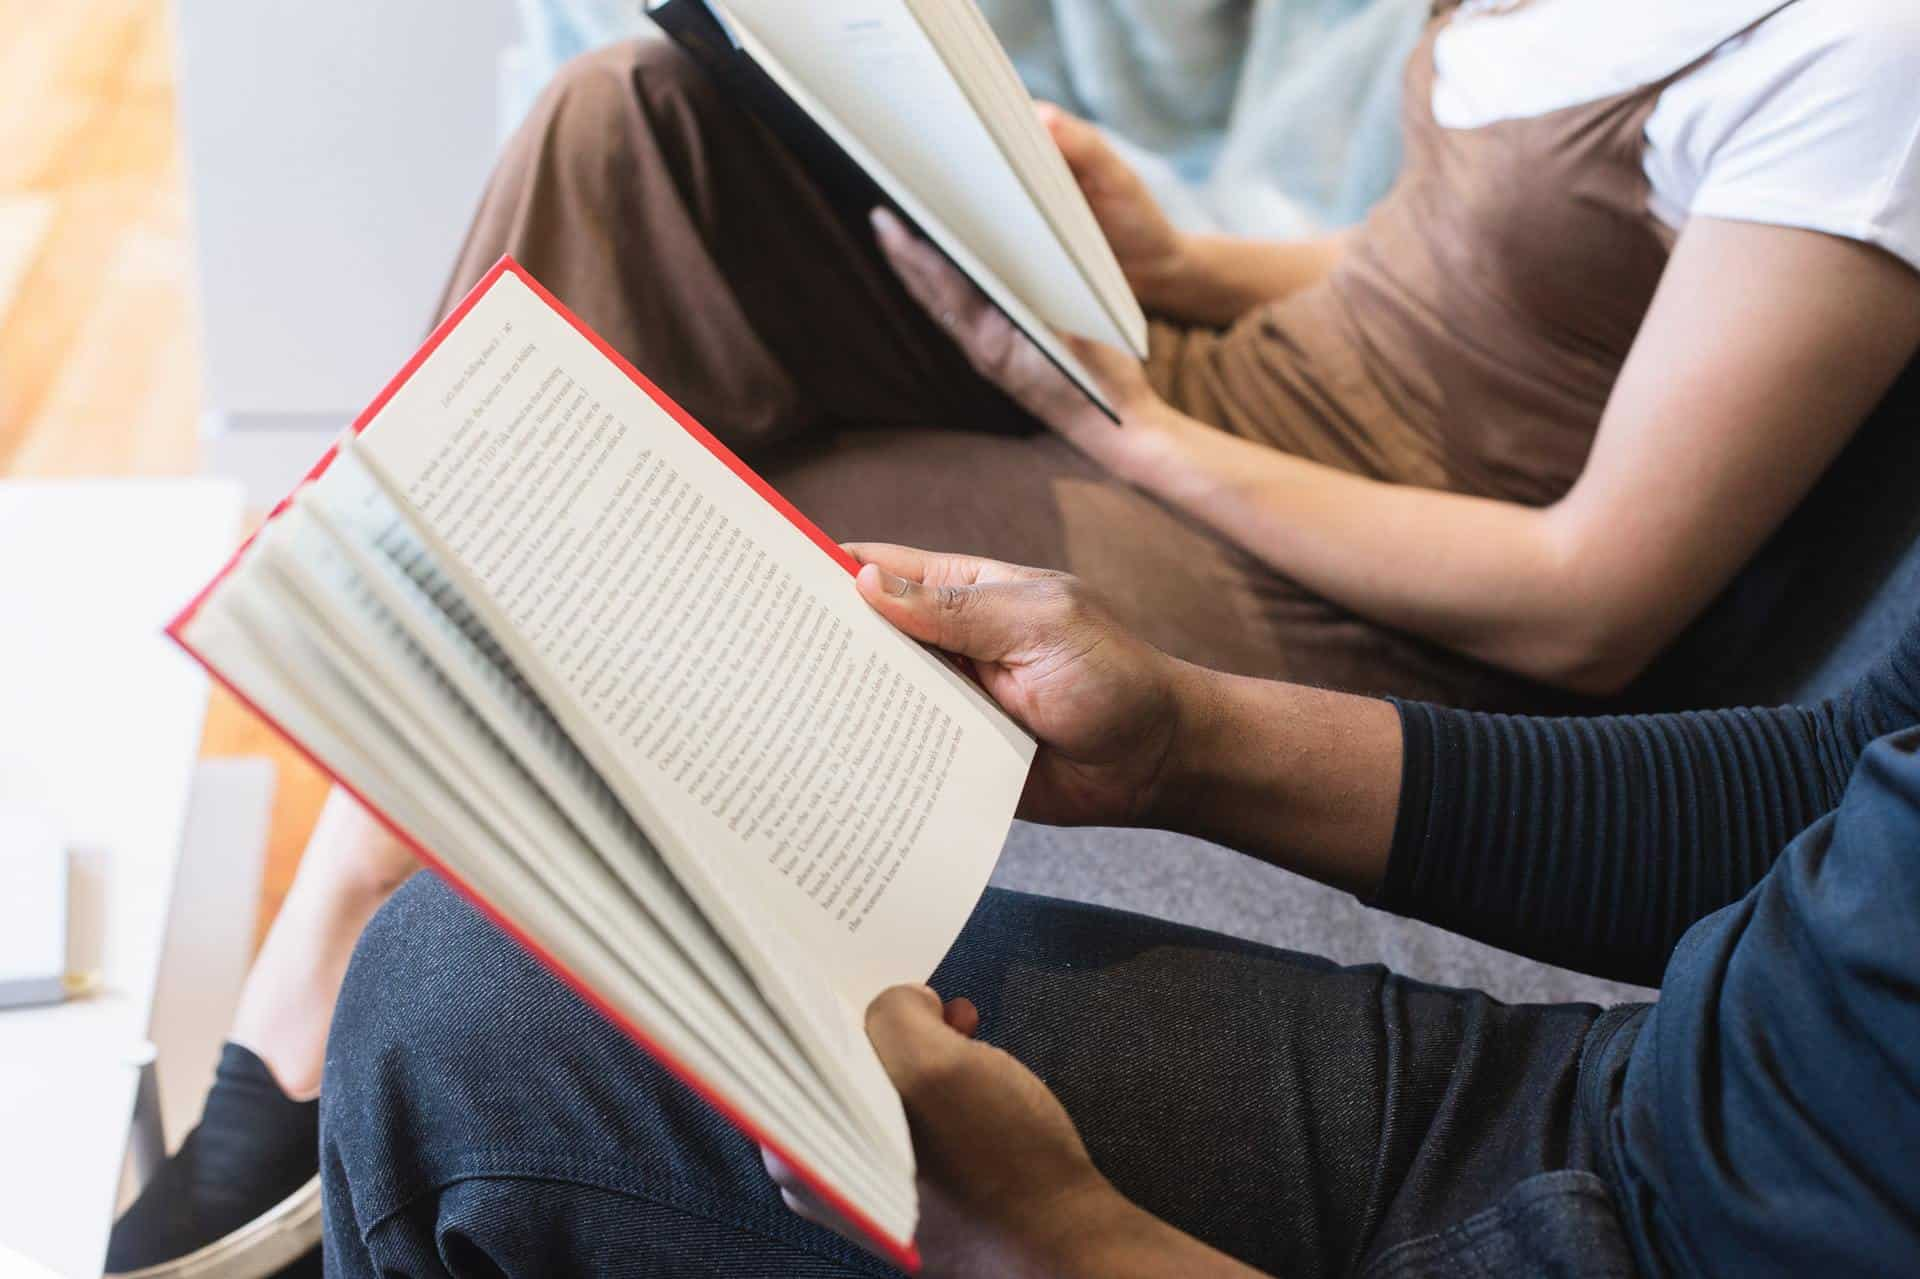 Moderne Literatuur Leesgroep In Dorpshuis De Blaercom In Blaricum